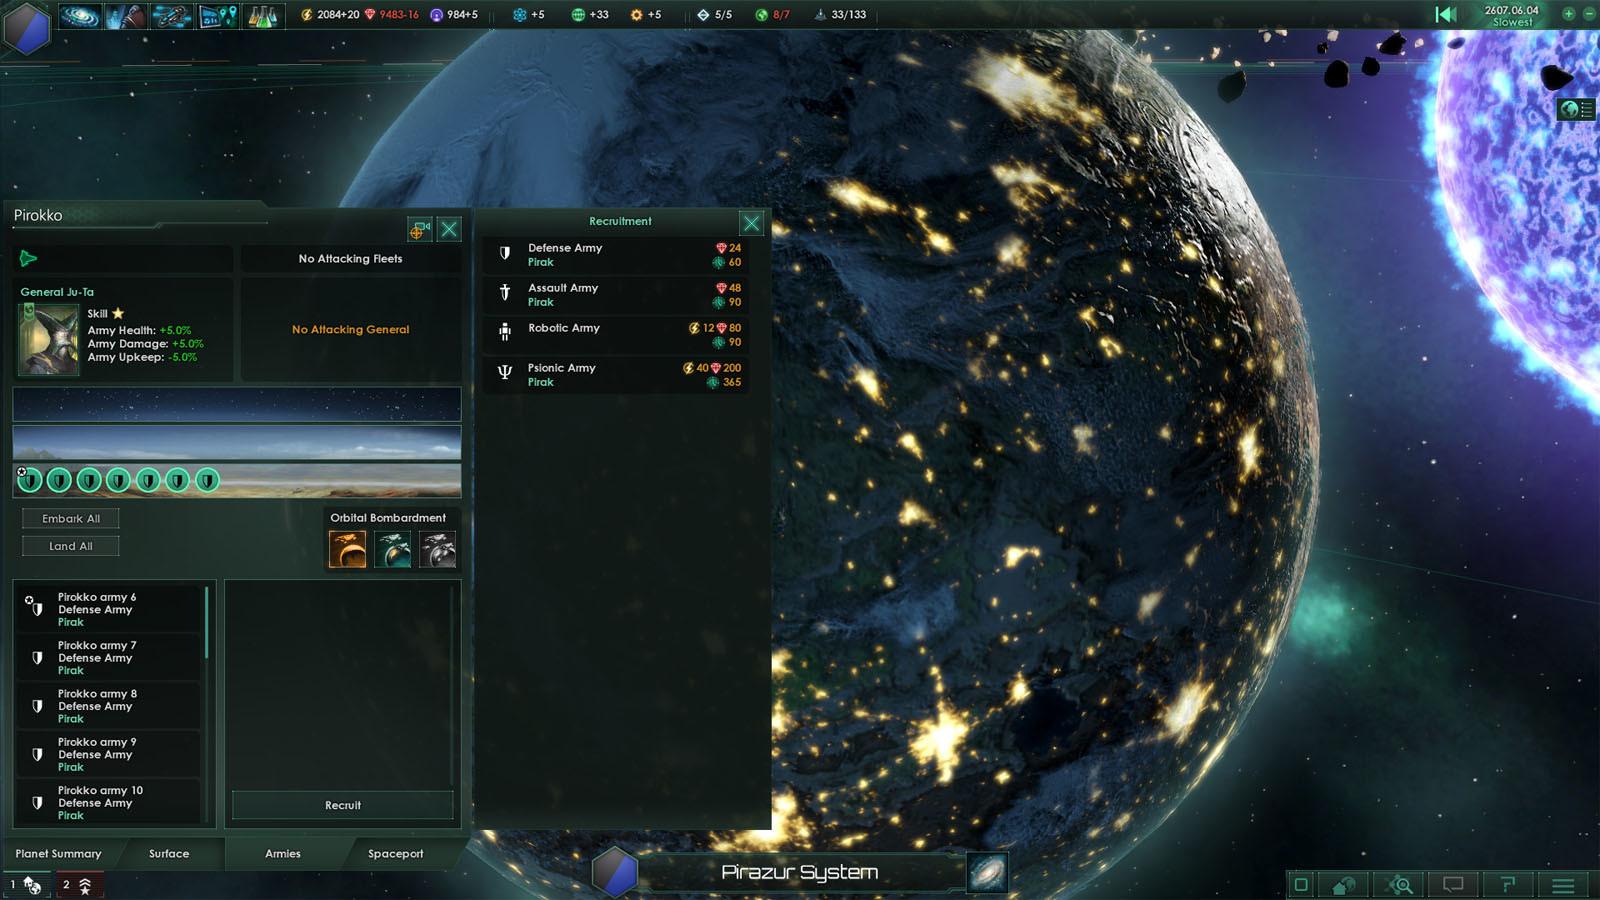 Stellaris - Galaxy Edition | ROW (2b50e2e9-947b-4141-9aa8-a64f7920b126)